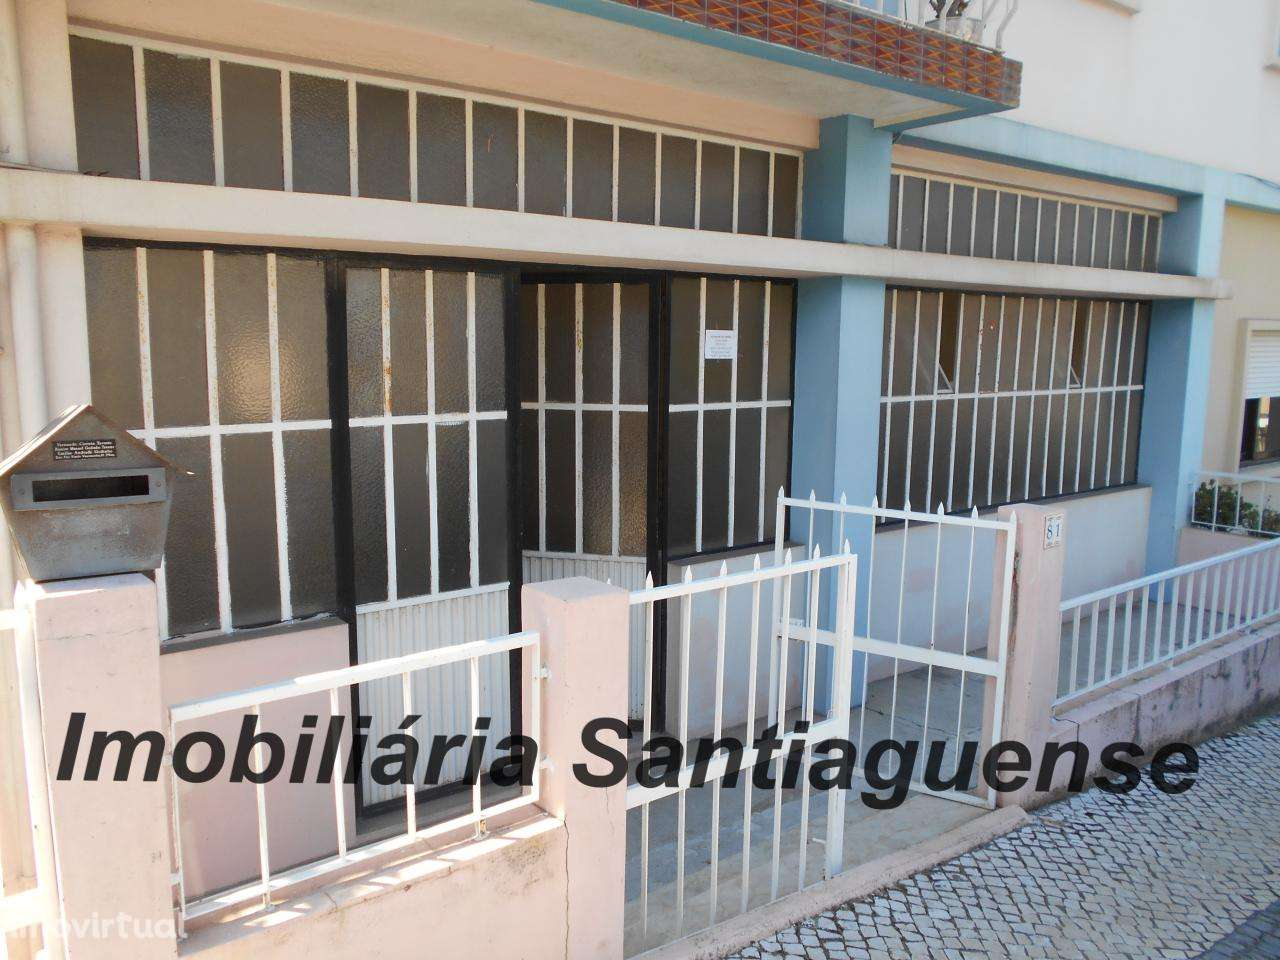 Loja para arrendar, Oliveira de Azeméis, Santiago de Riba-Ul, Ul, Macinhata da Seixa e Madail, Oliveira de Azeméis, Aveiro - Foto 1